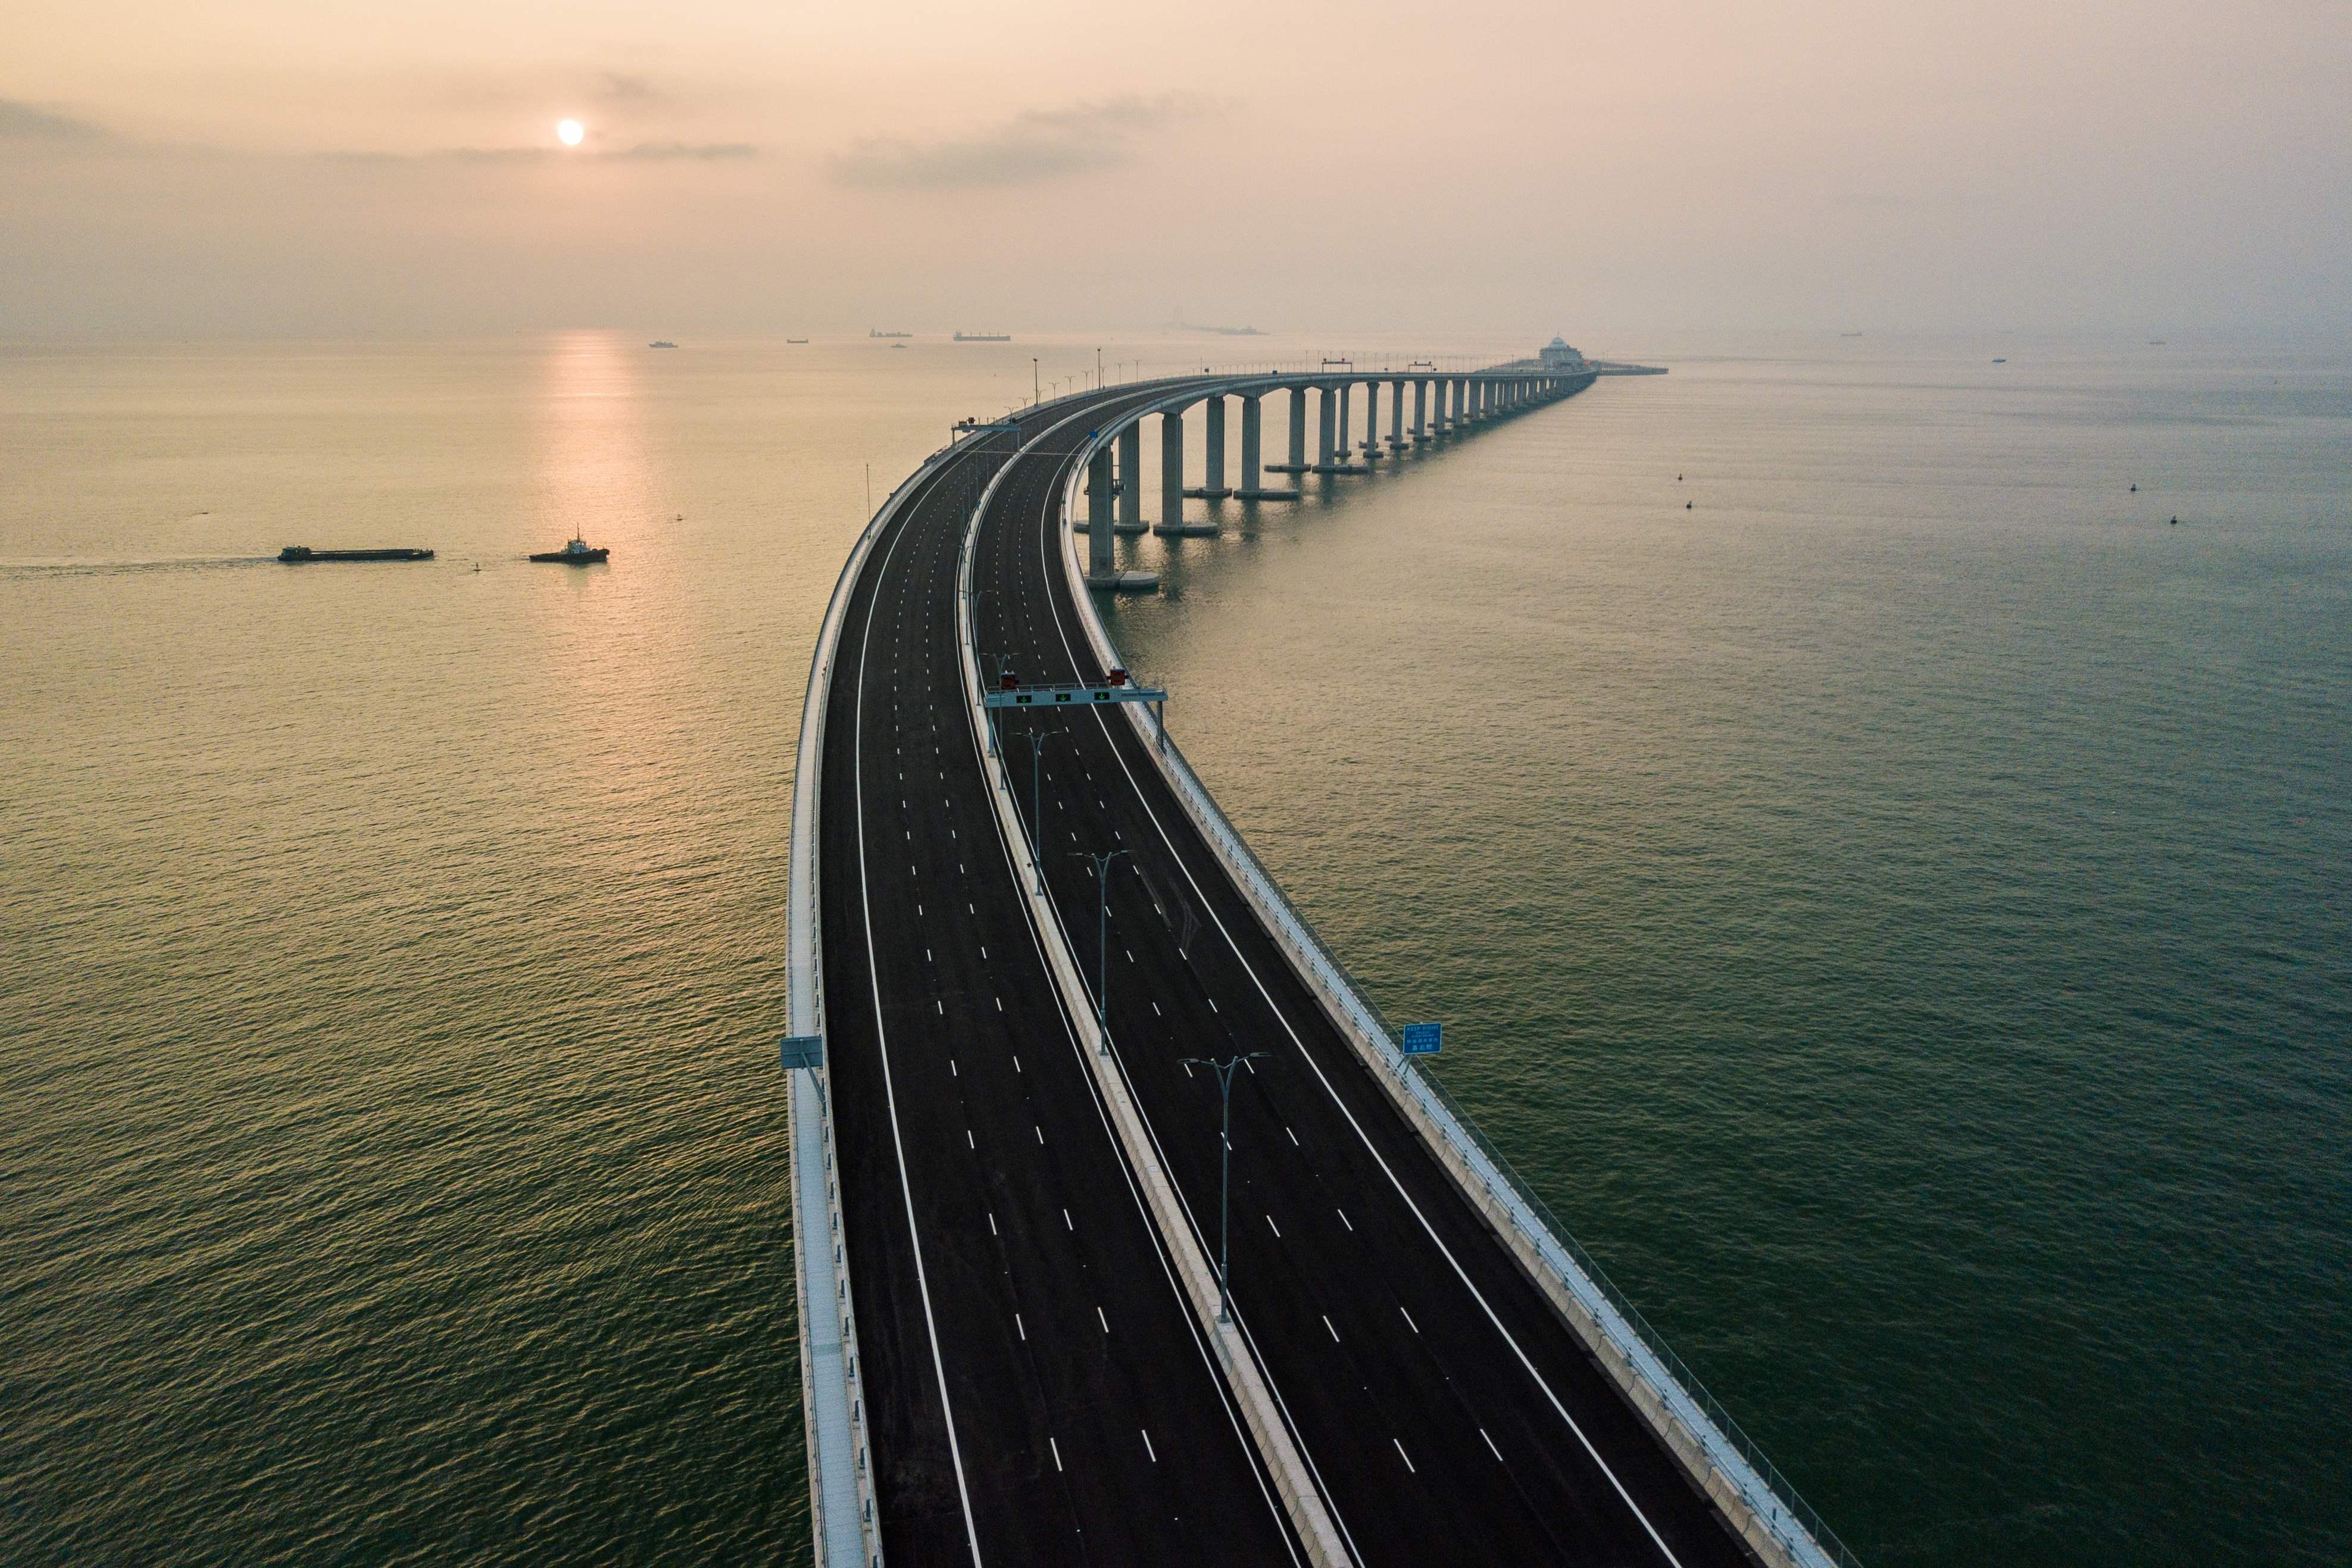 Hong Kong: New $20 billion bridge to Chinese mainland draws